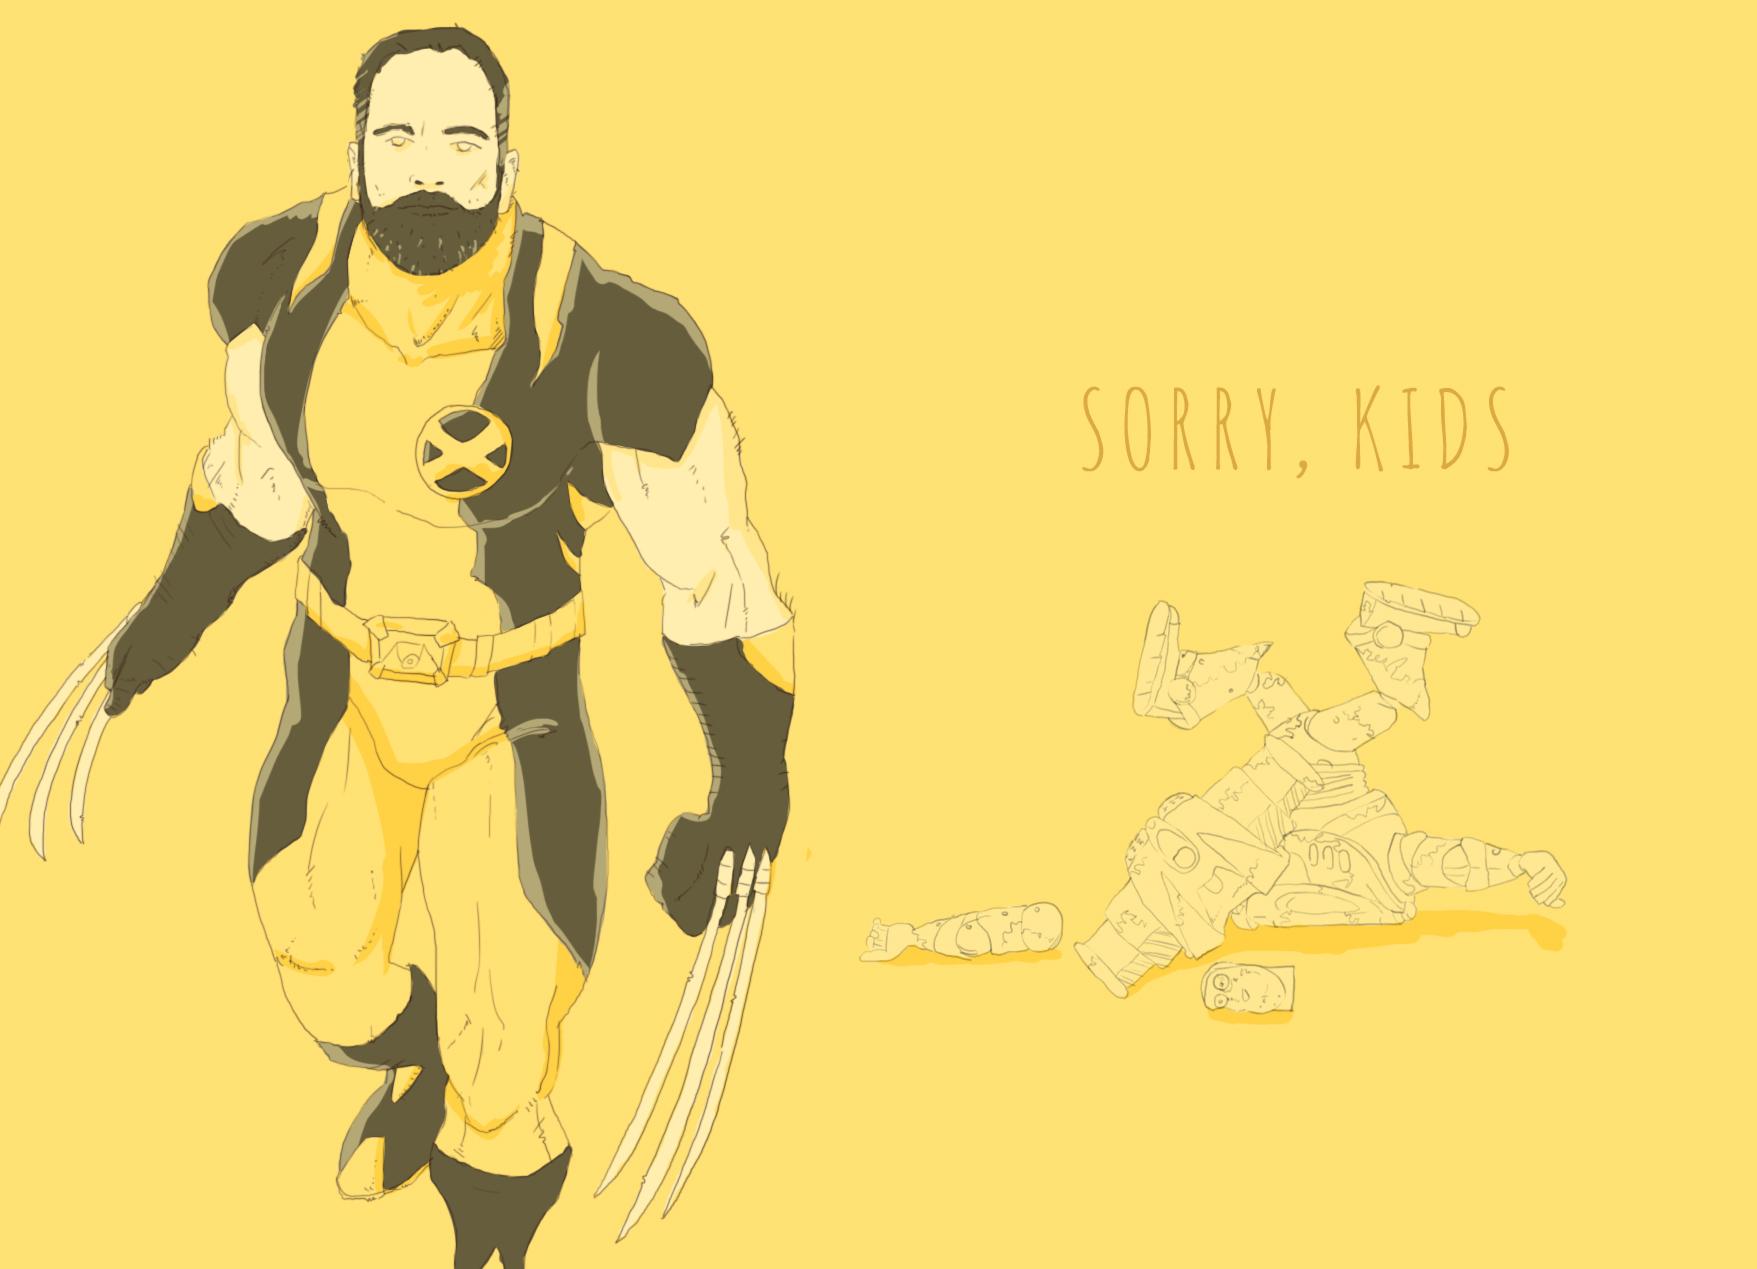 Sorry, Kids